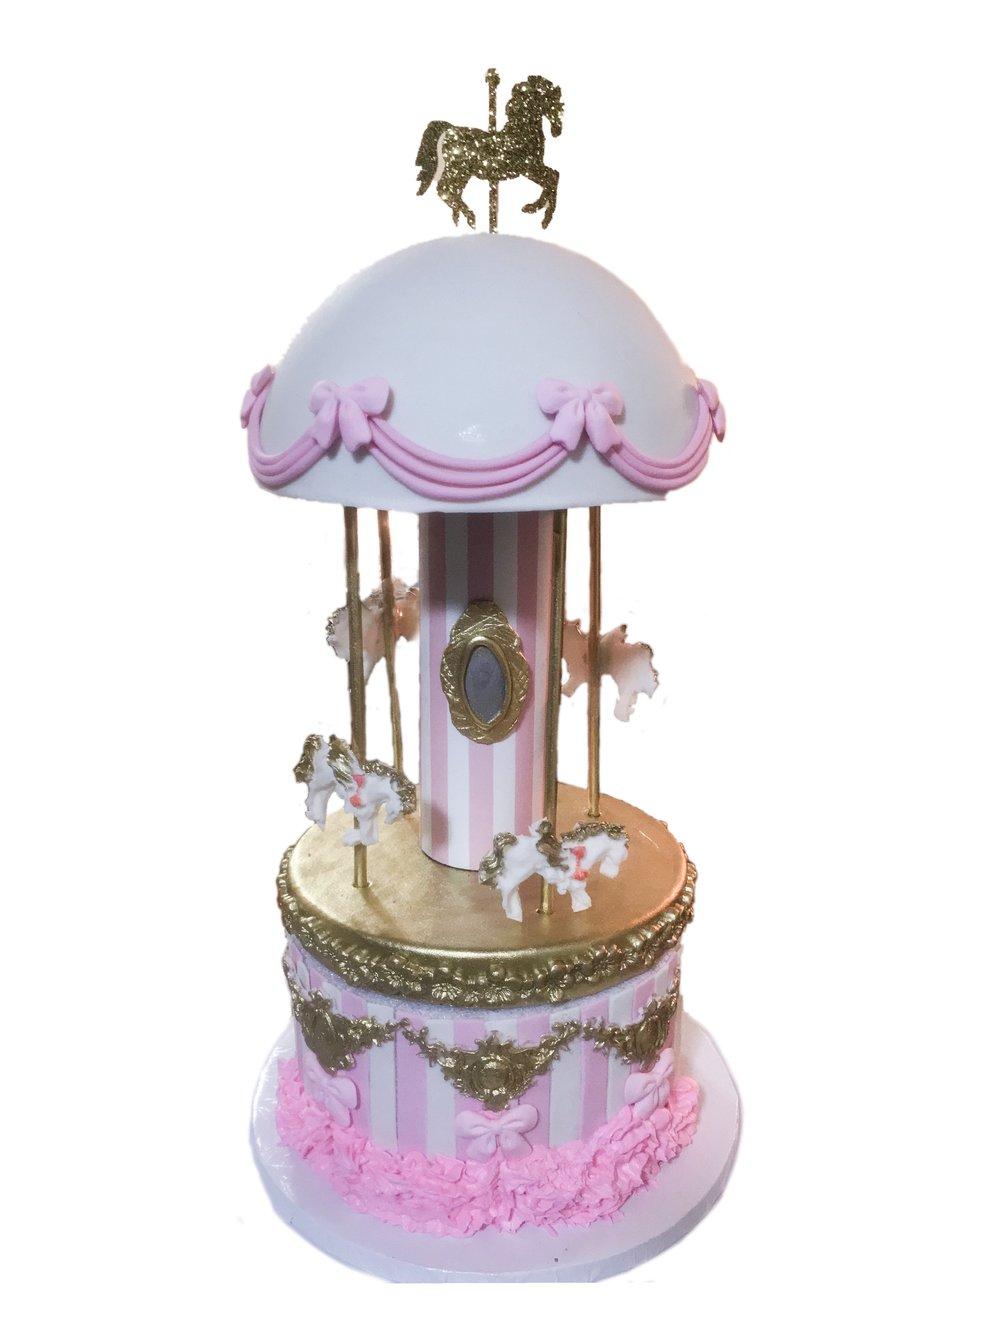 3D Carousel Cake